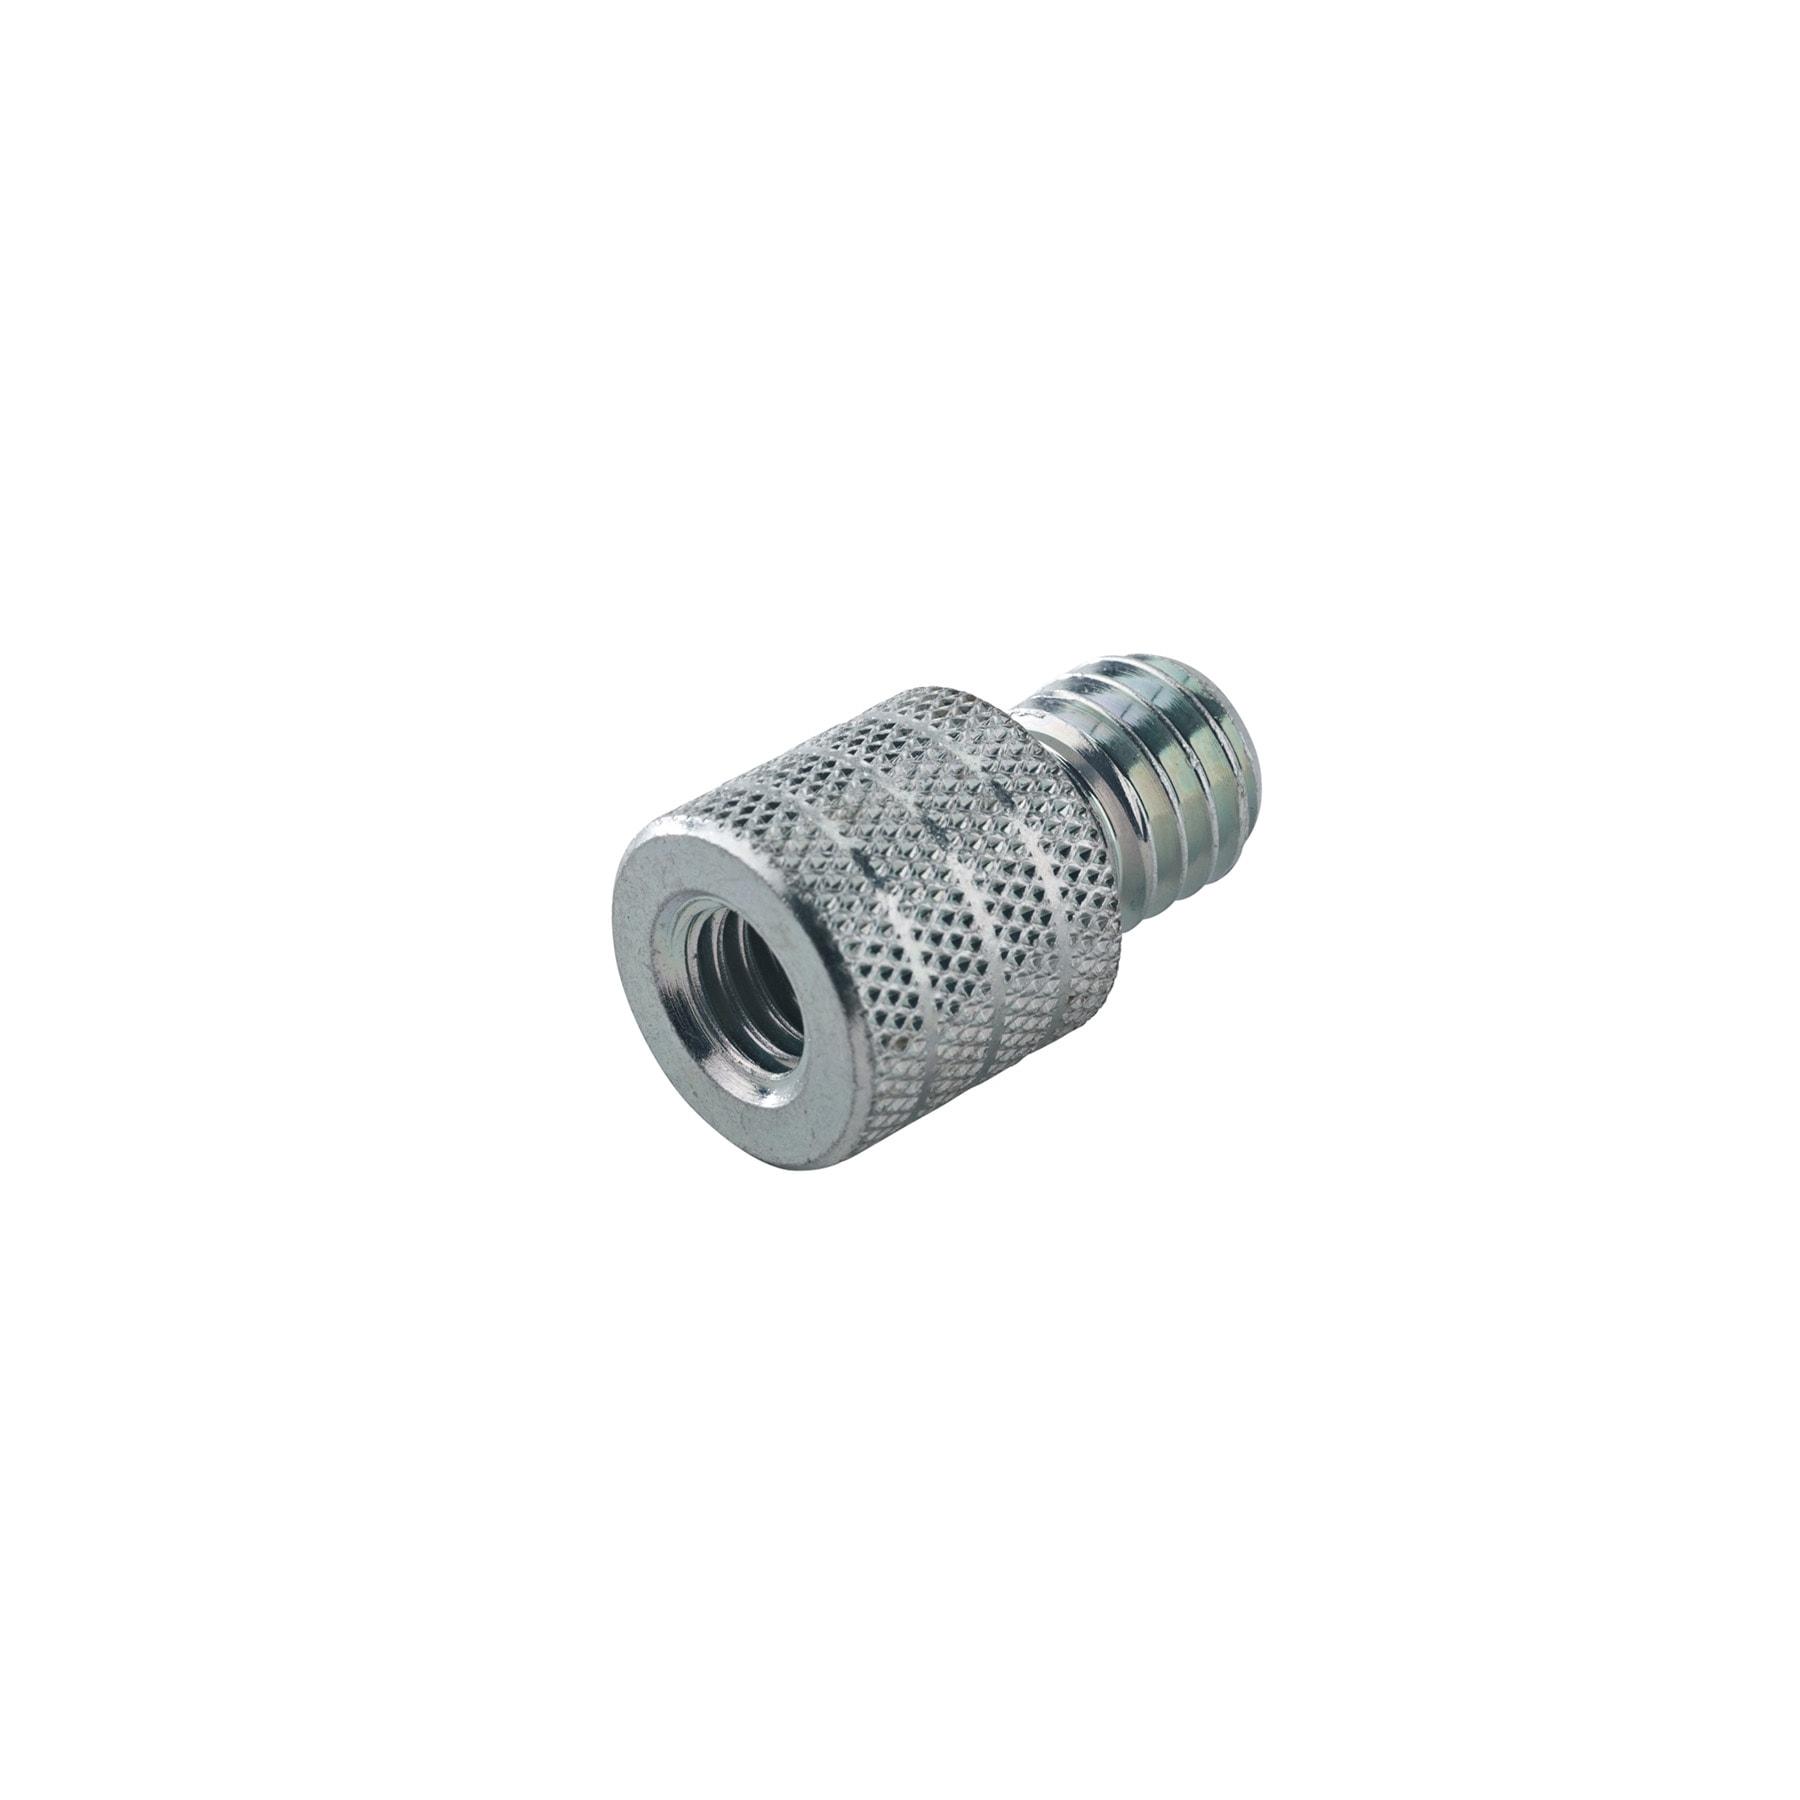 KM219 - Thread adapter